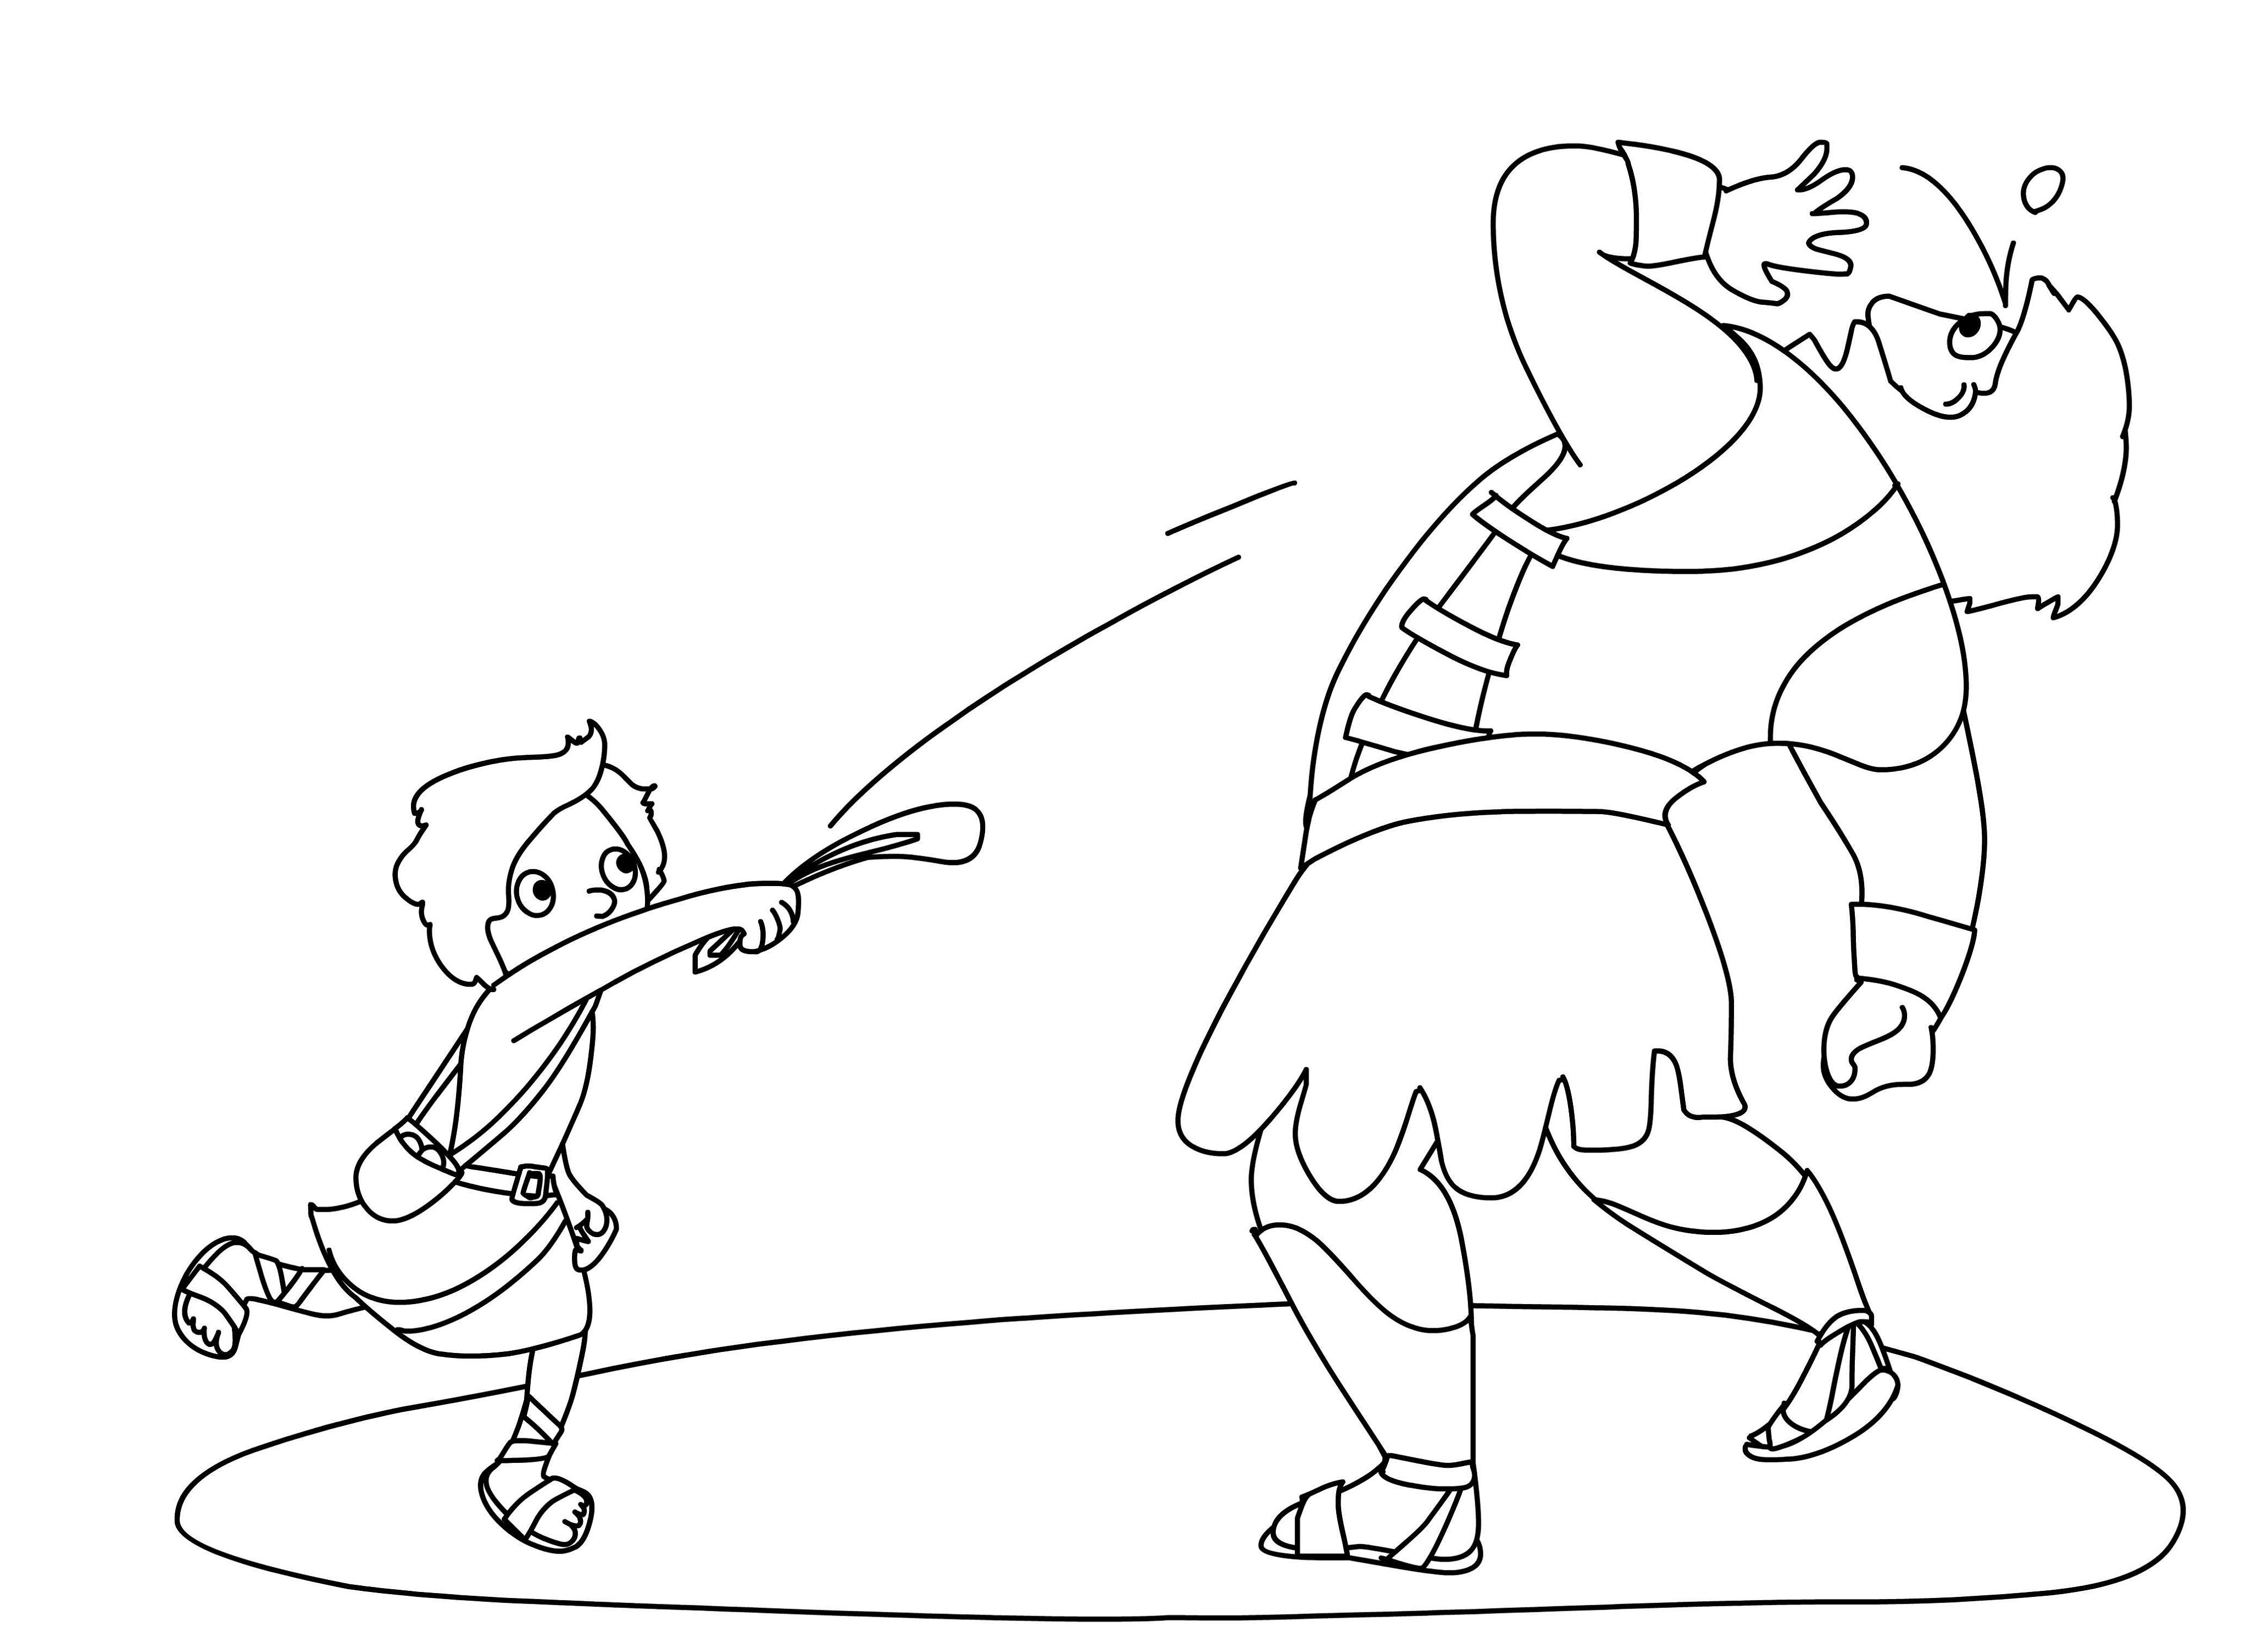 David And Goliath Coloring Page Preschool